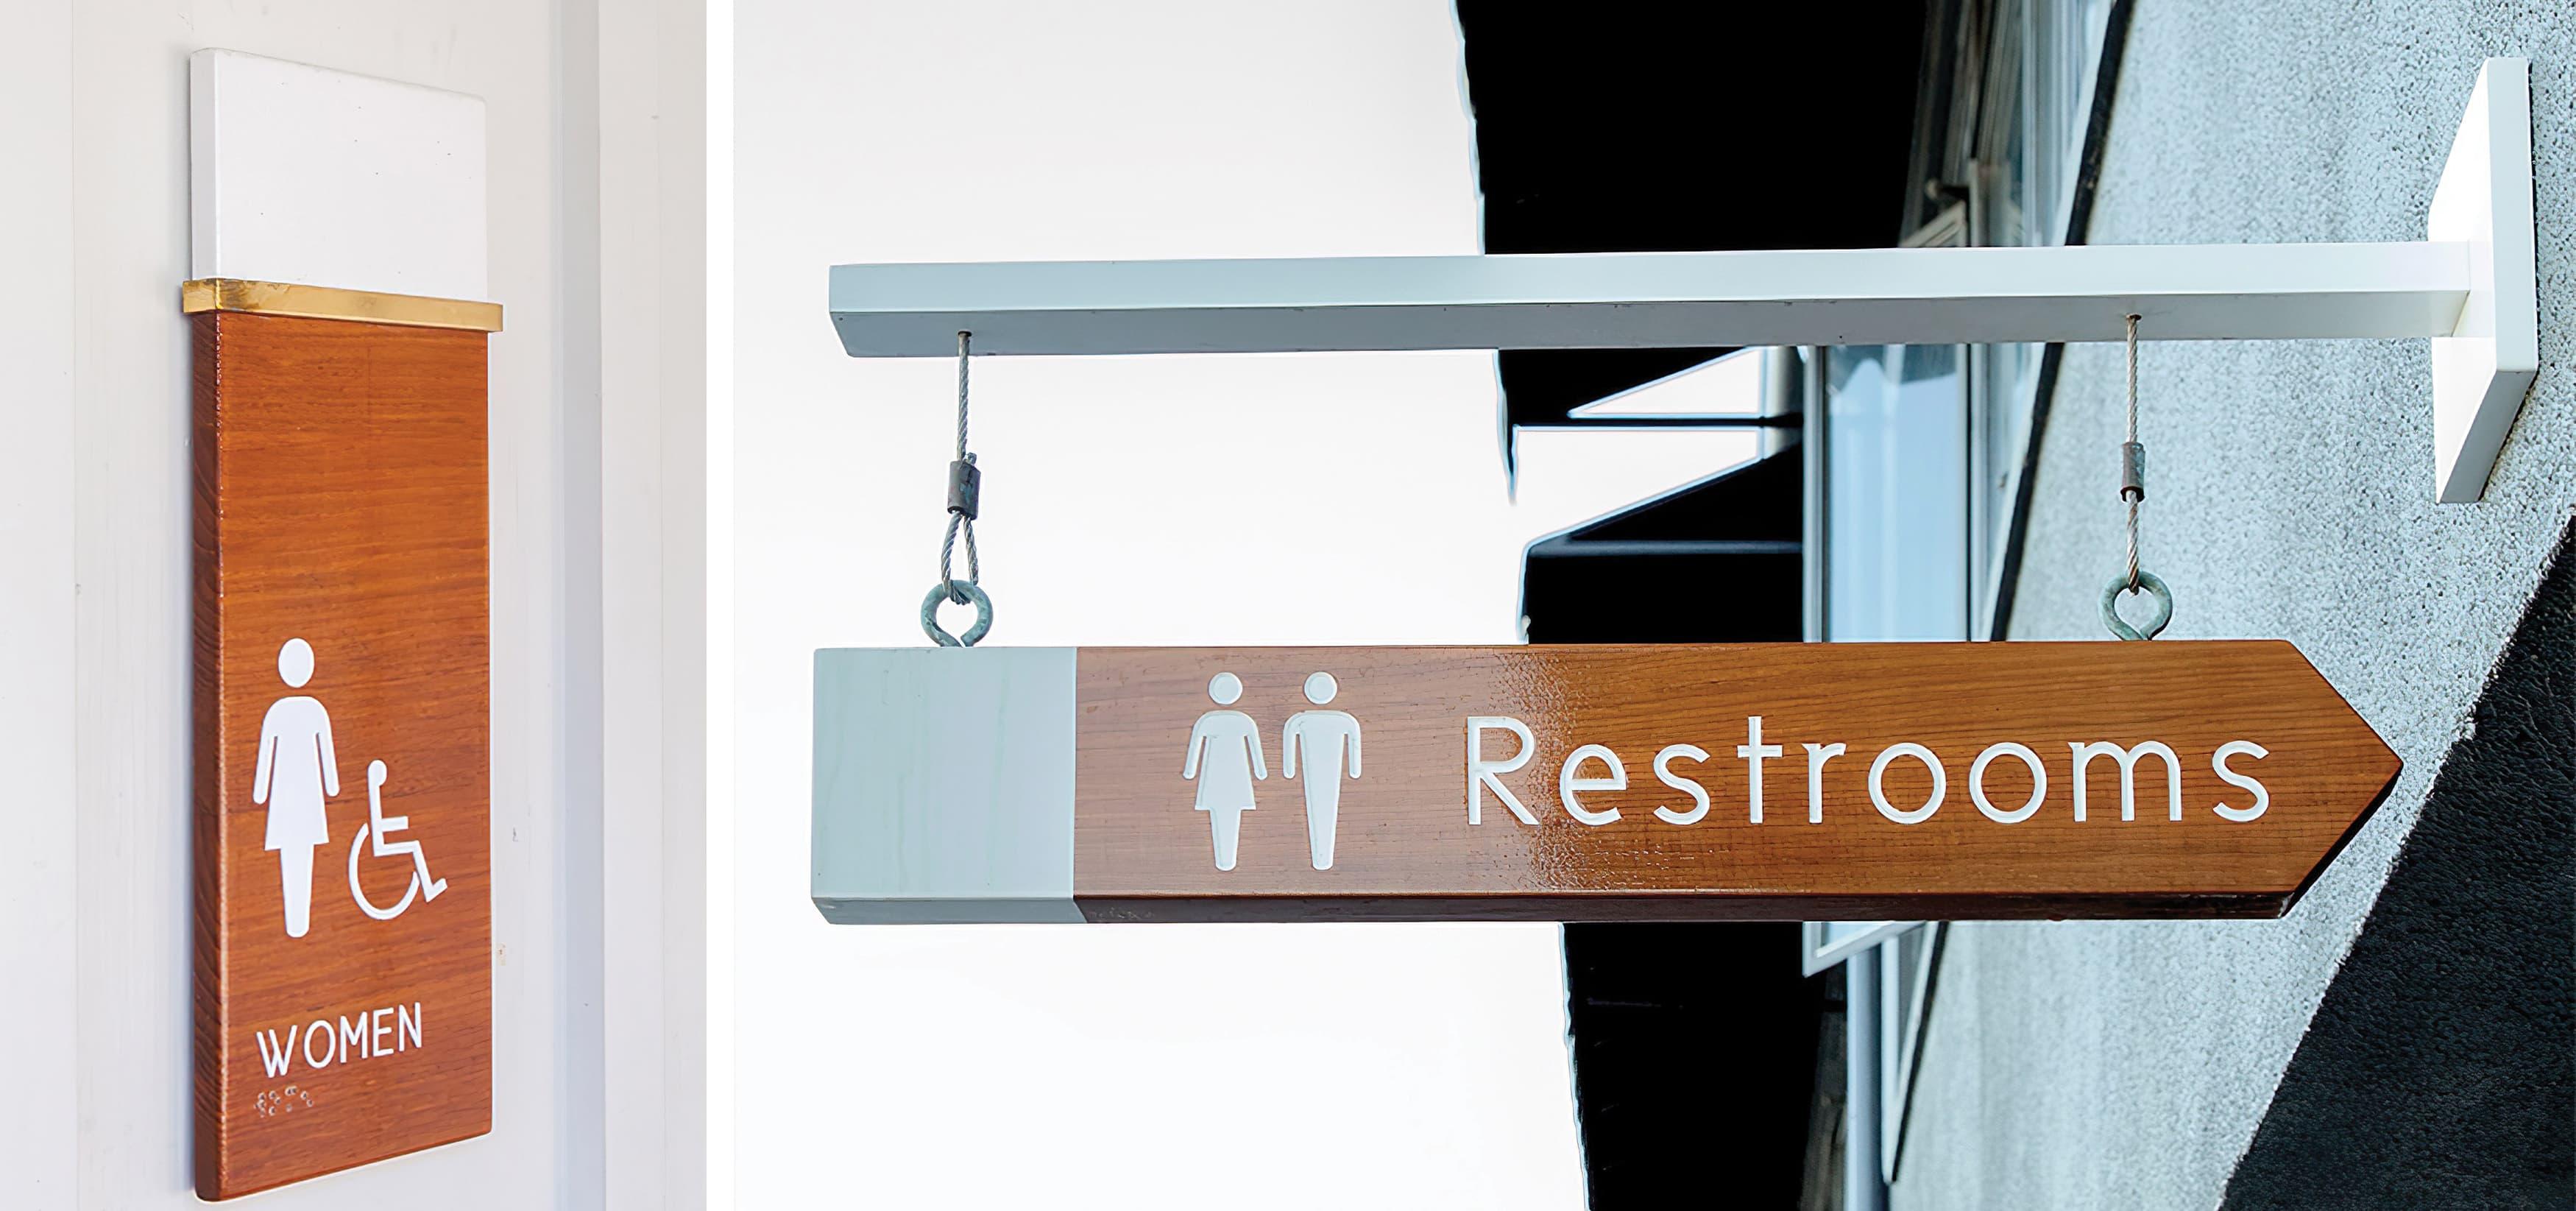 Lido Marina Village Newport Beach pedestrian wayfinding design and restroom signage